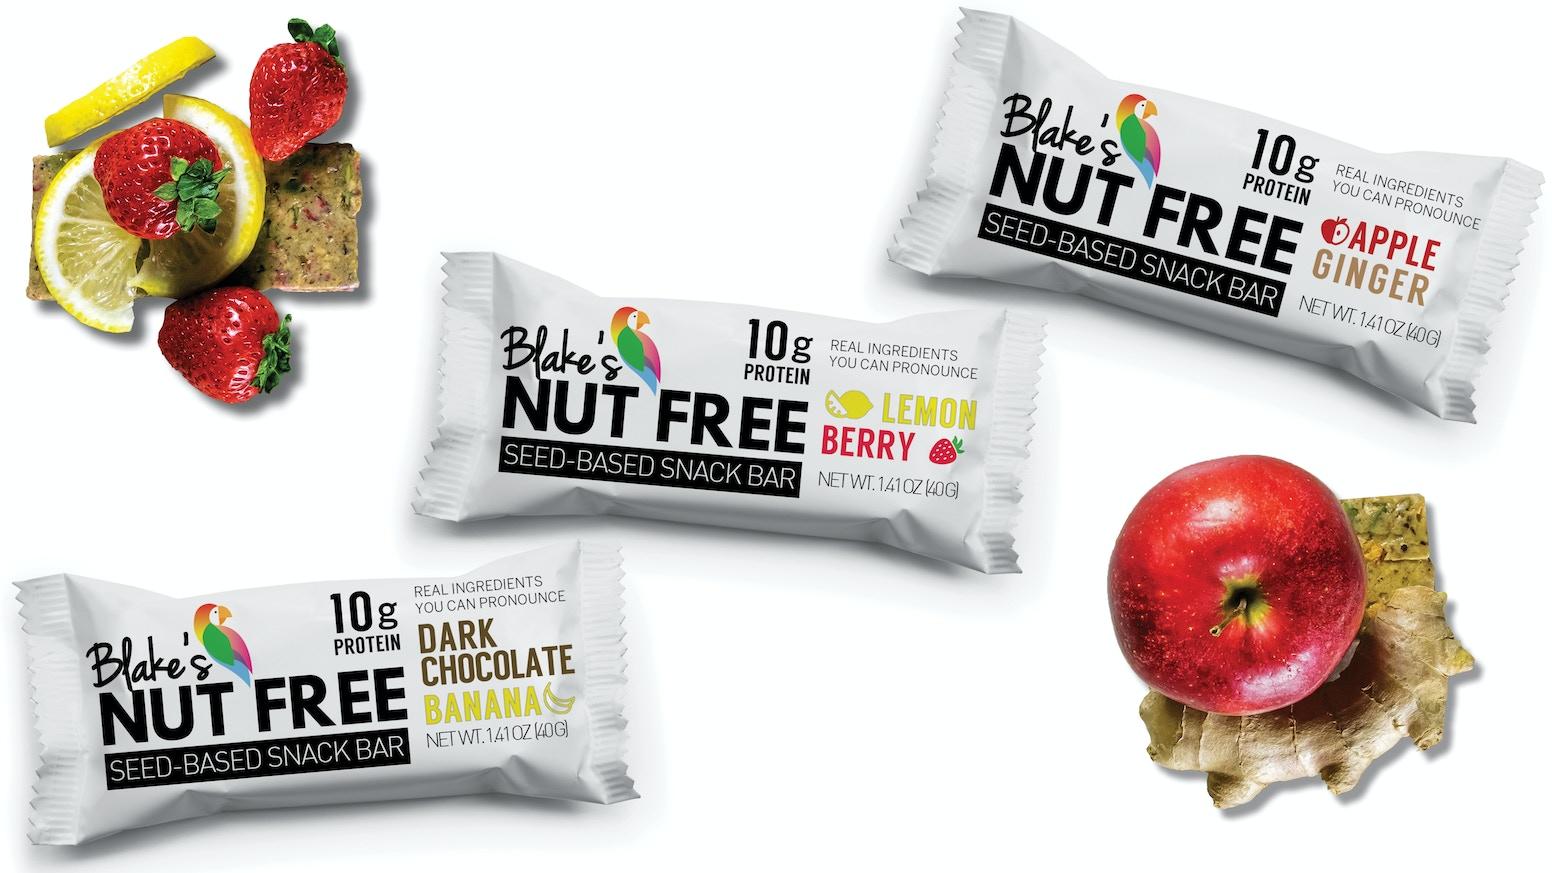 Nut-Free & Gluten-Free Snack Bars